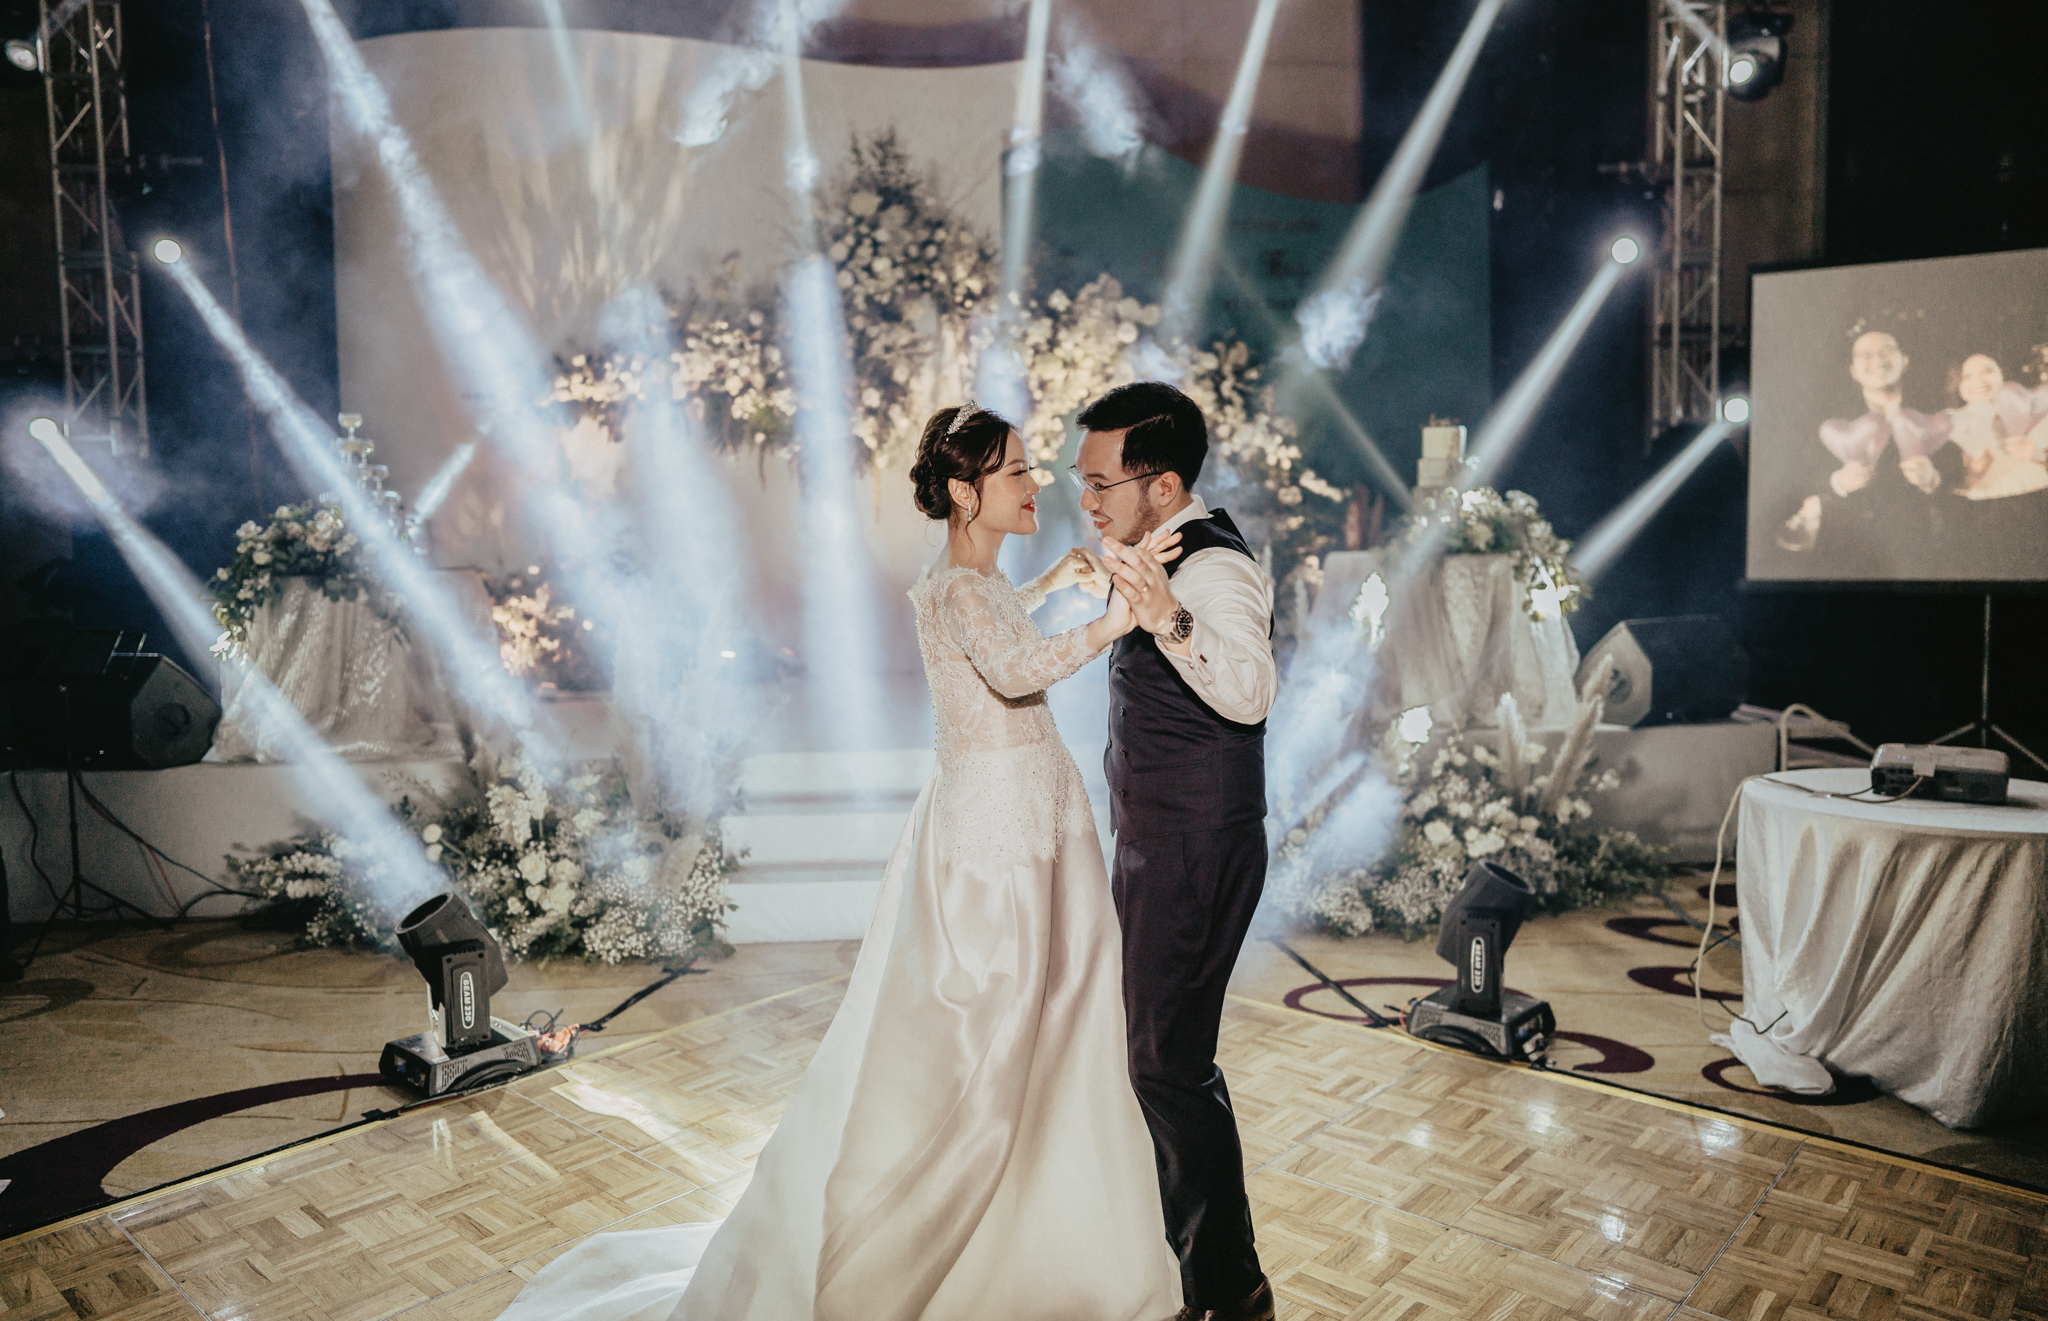 JWMarriott Ha Noi Intimate Wedding of Trang Hi well captured by Hipster Wedding Vietnam Wedding Photographer-36295.jpg